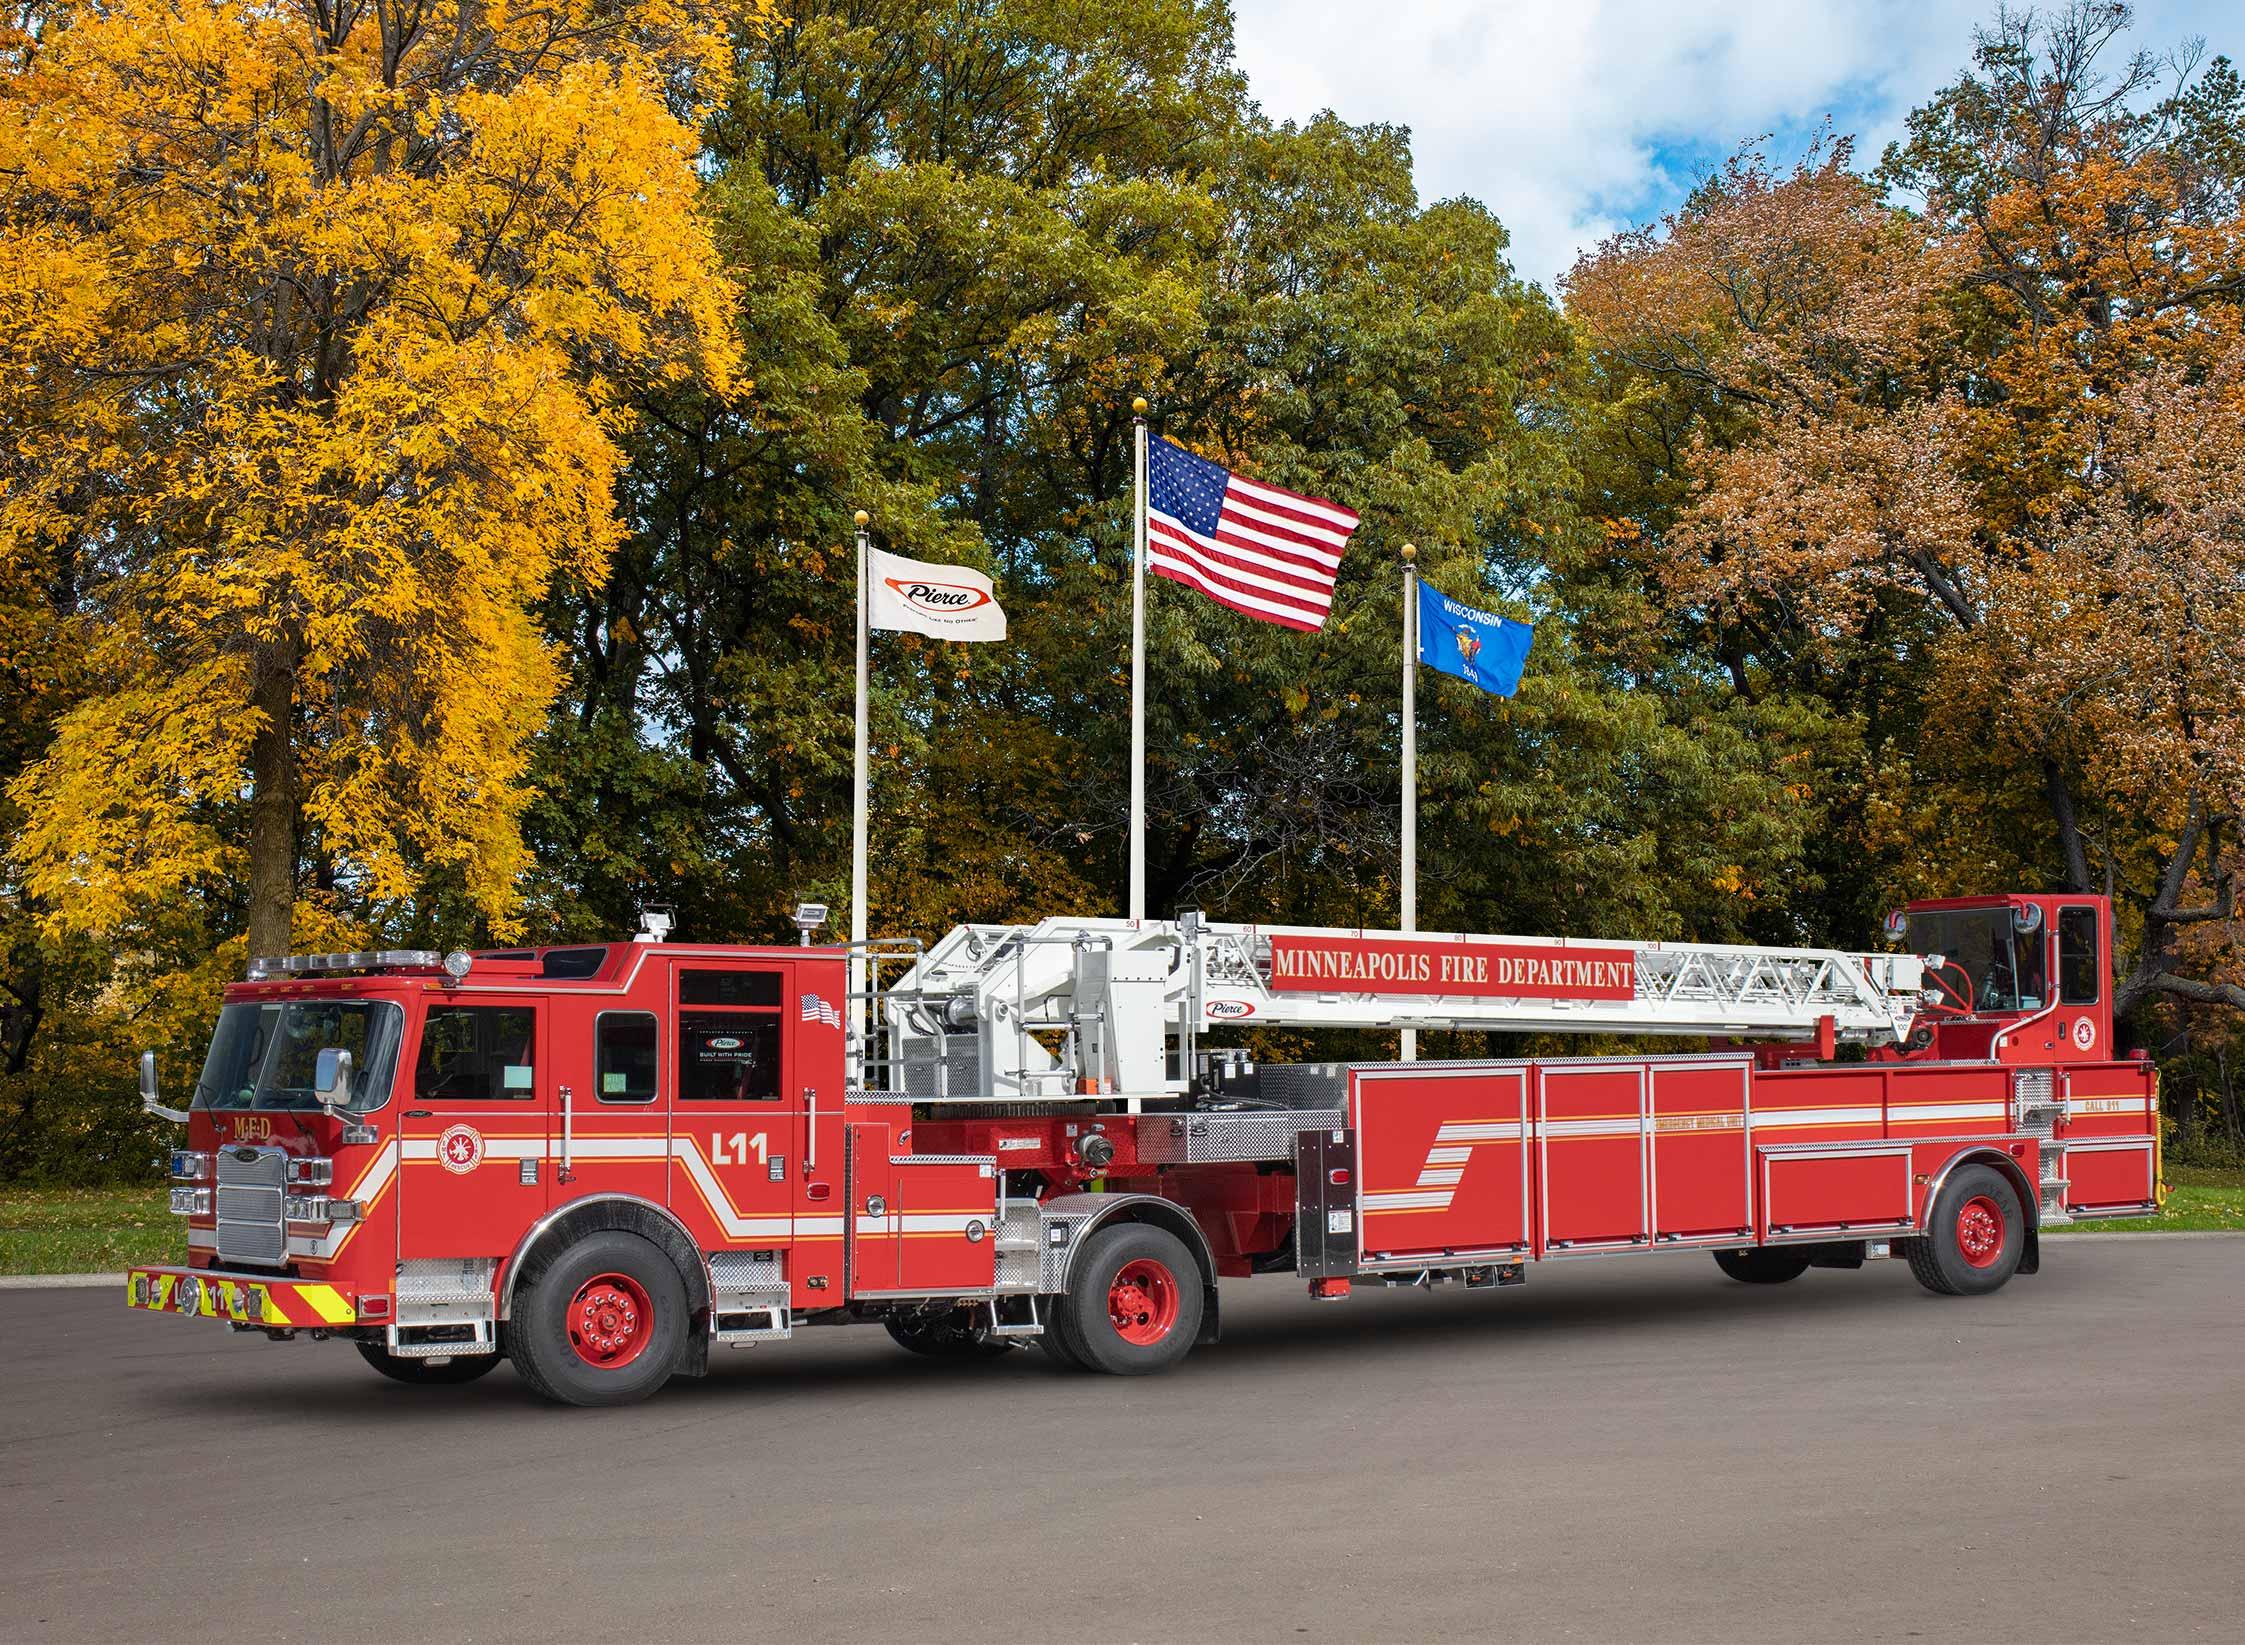 Minneapolis Fire Department - Aerial